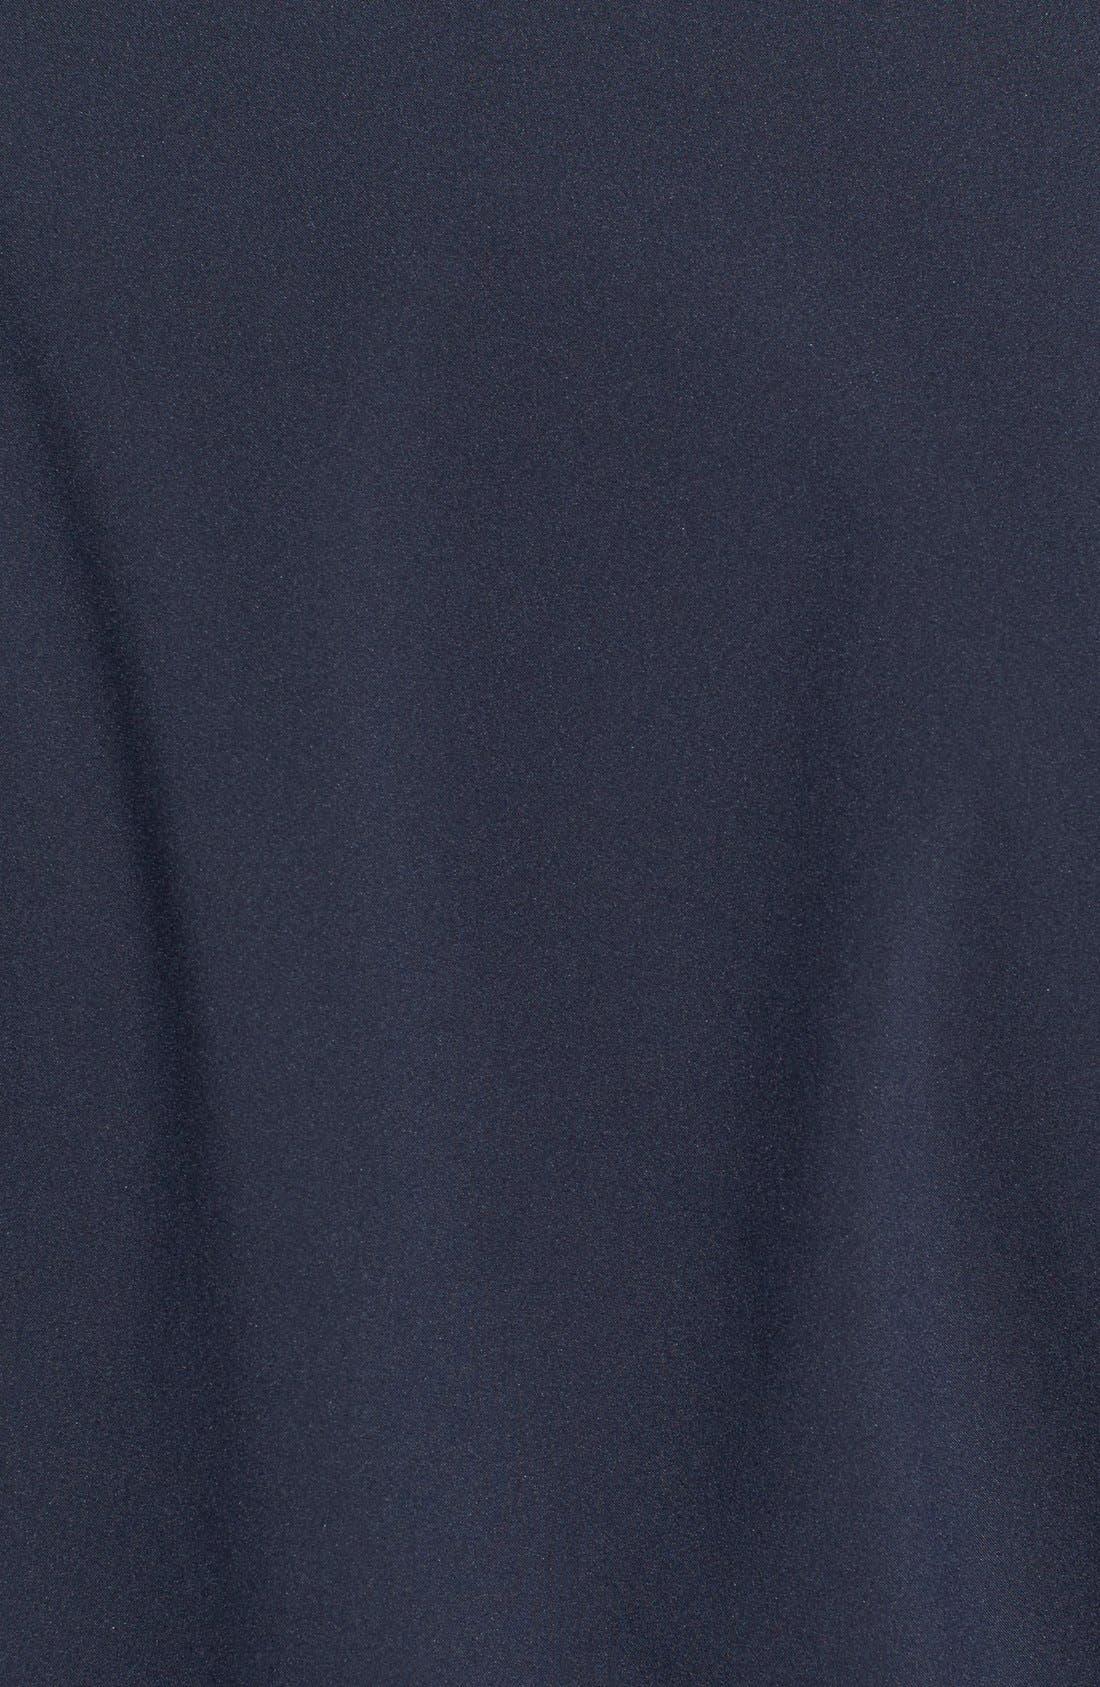 'Summit' WeatherTec Wind & Water Resistant Half Zip Jacket,                             Alternate thumbnail 3, color,                             Navy Blue